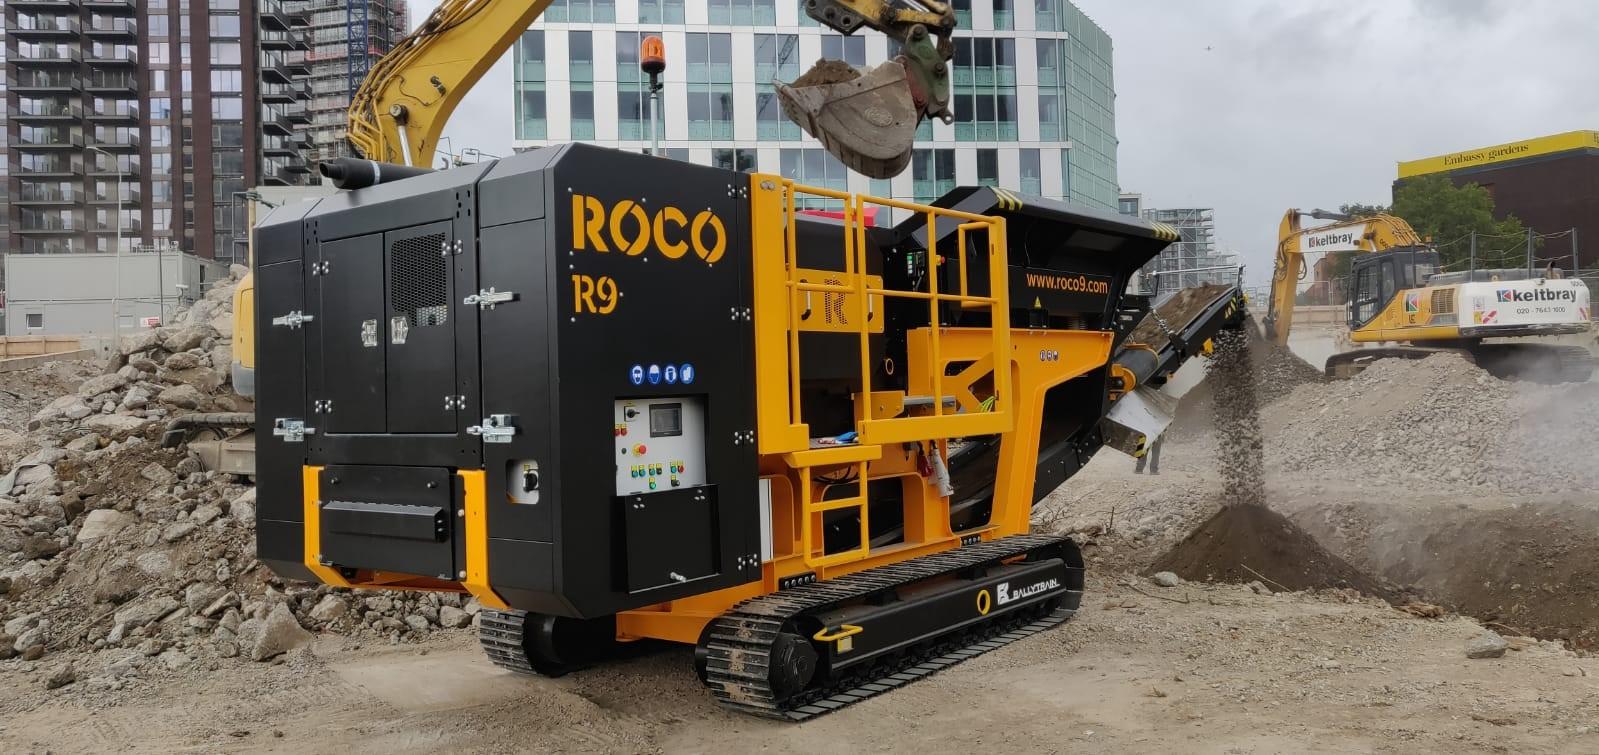 ROCO R9R Crushing Concrete with Rebar